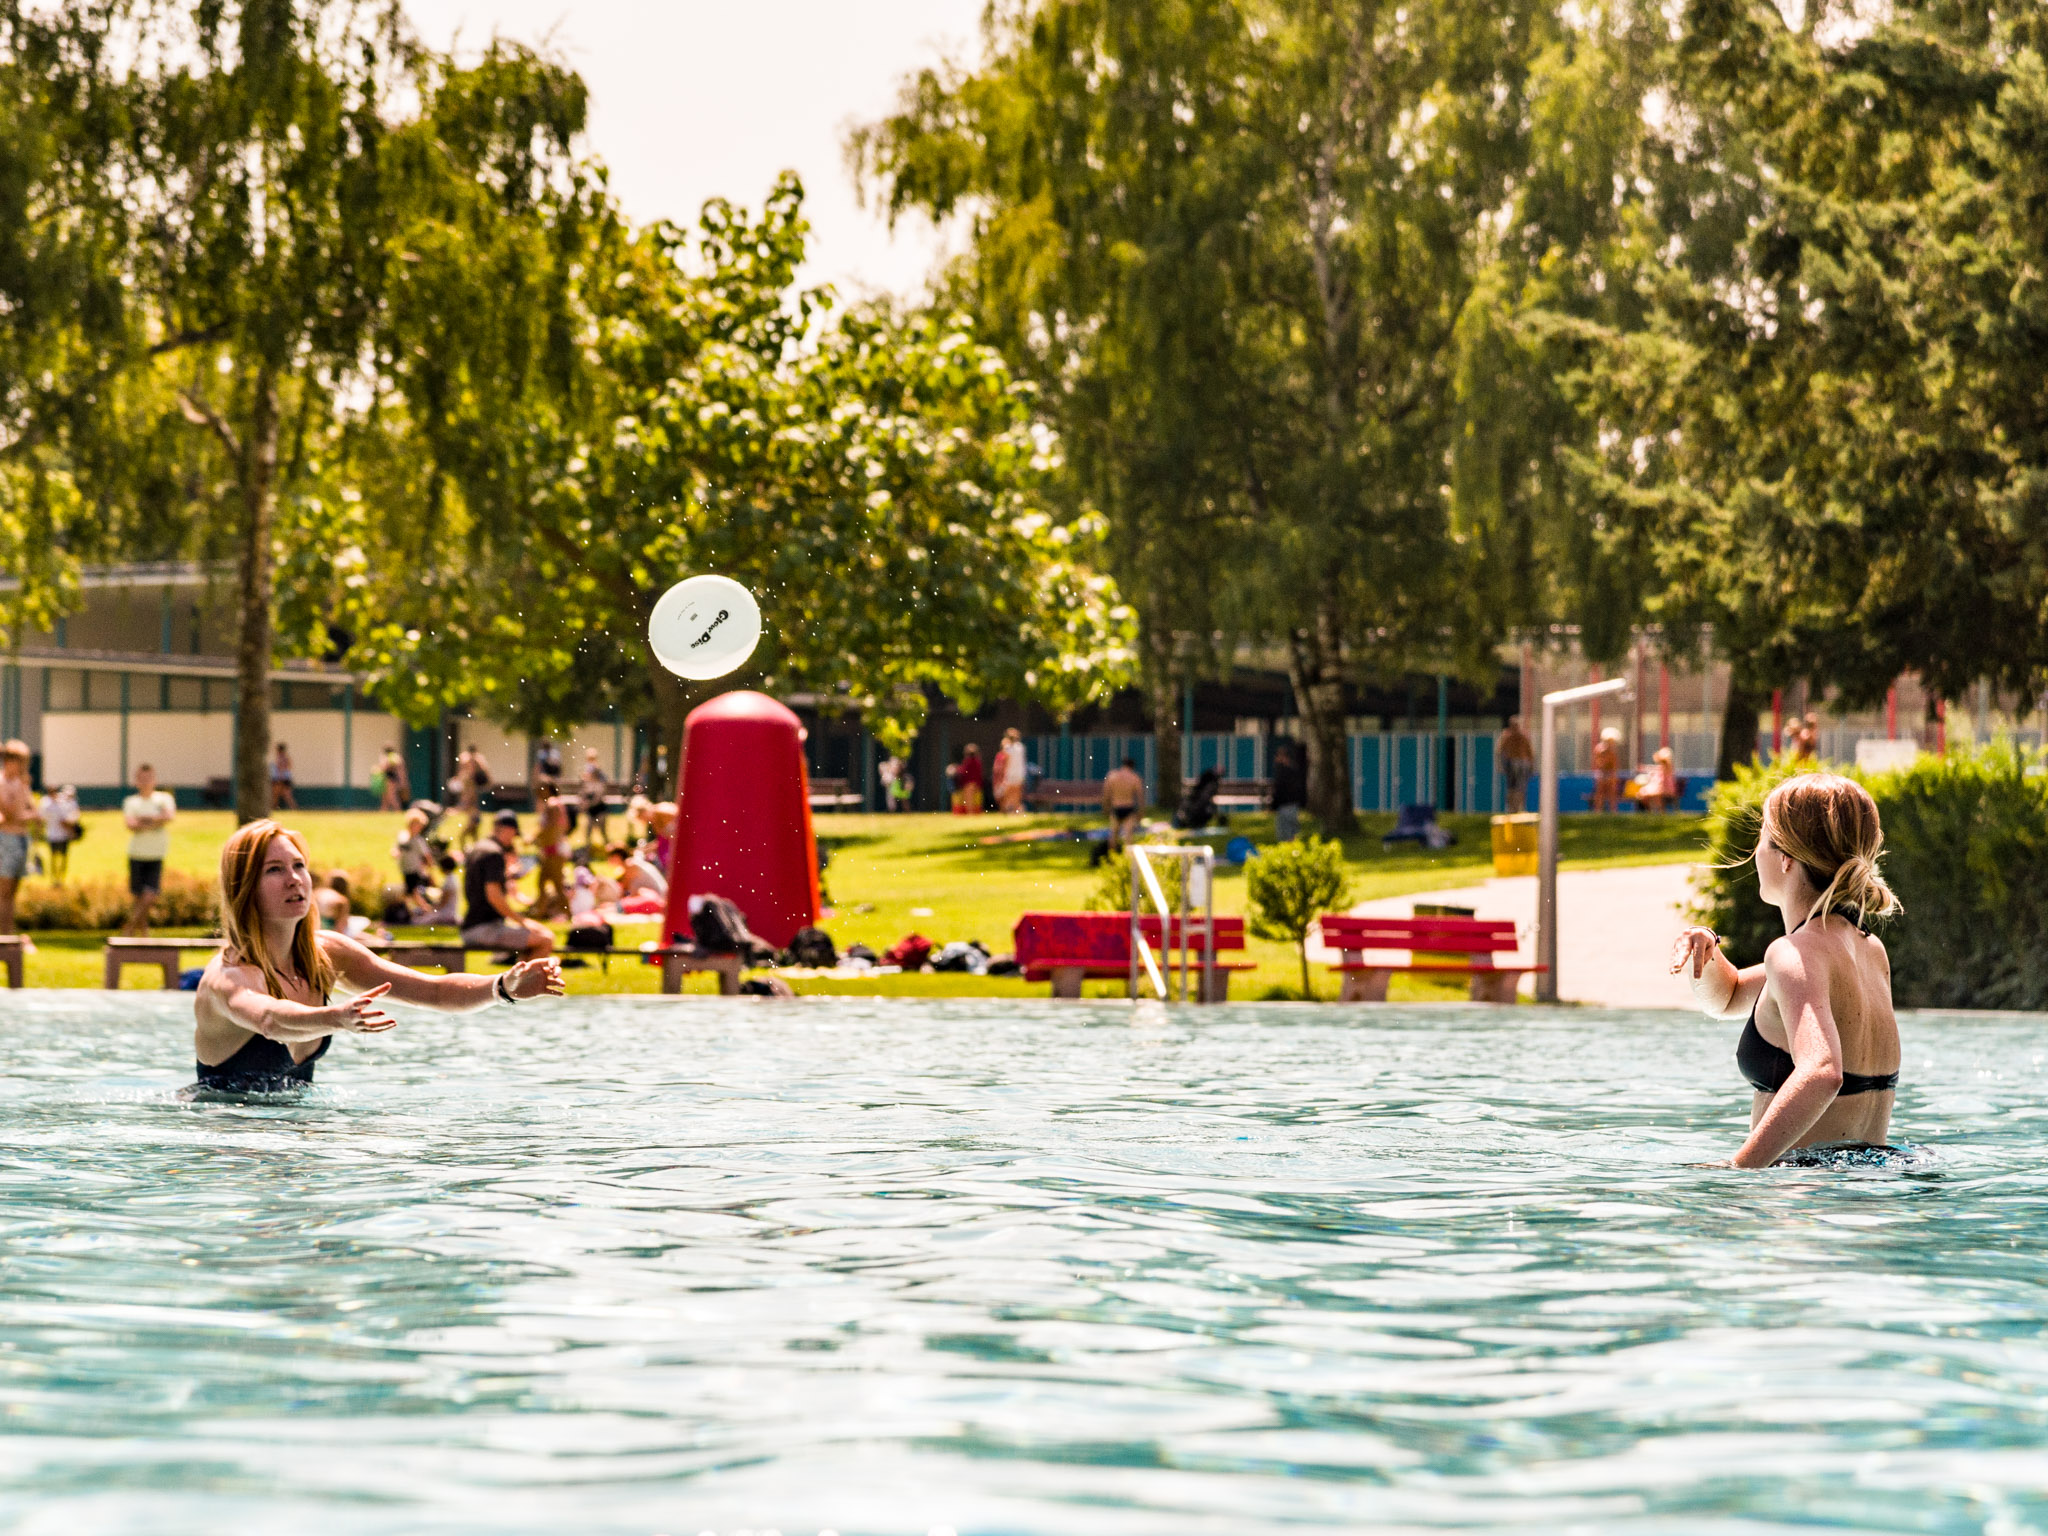 Entspannt den Sommer genießen! Foto: Pascal Höfig